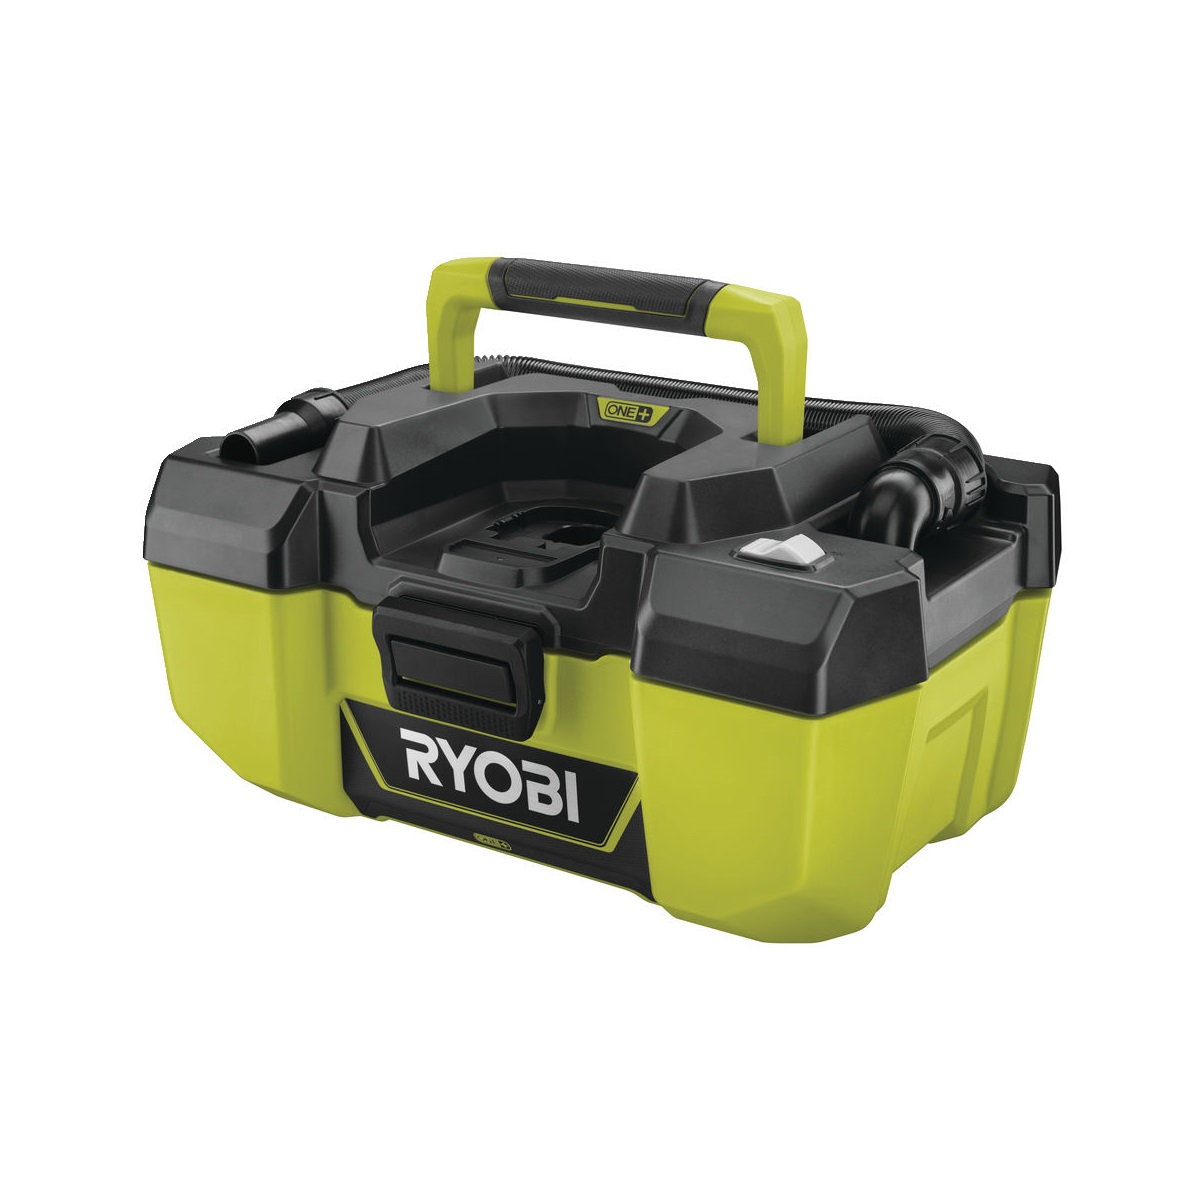 Ryobi R18PV-0, aku 18V dílenský vysavač ONE+ (bez baterie a nabíječky)